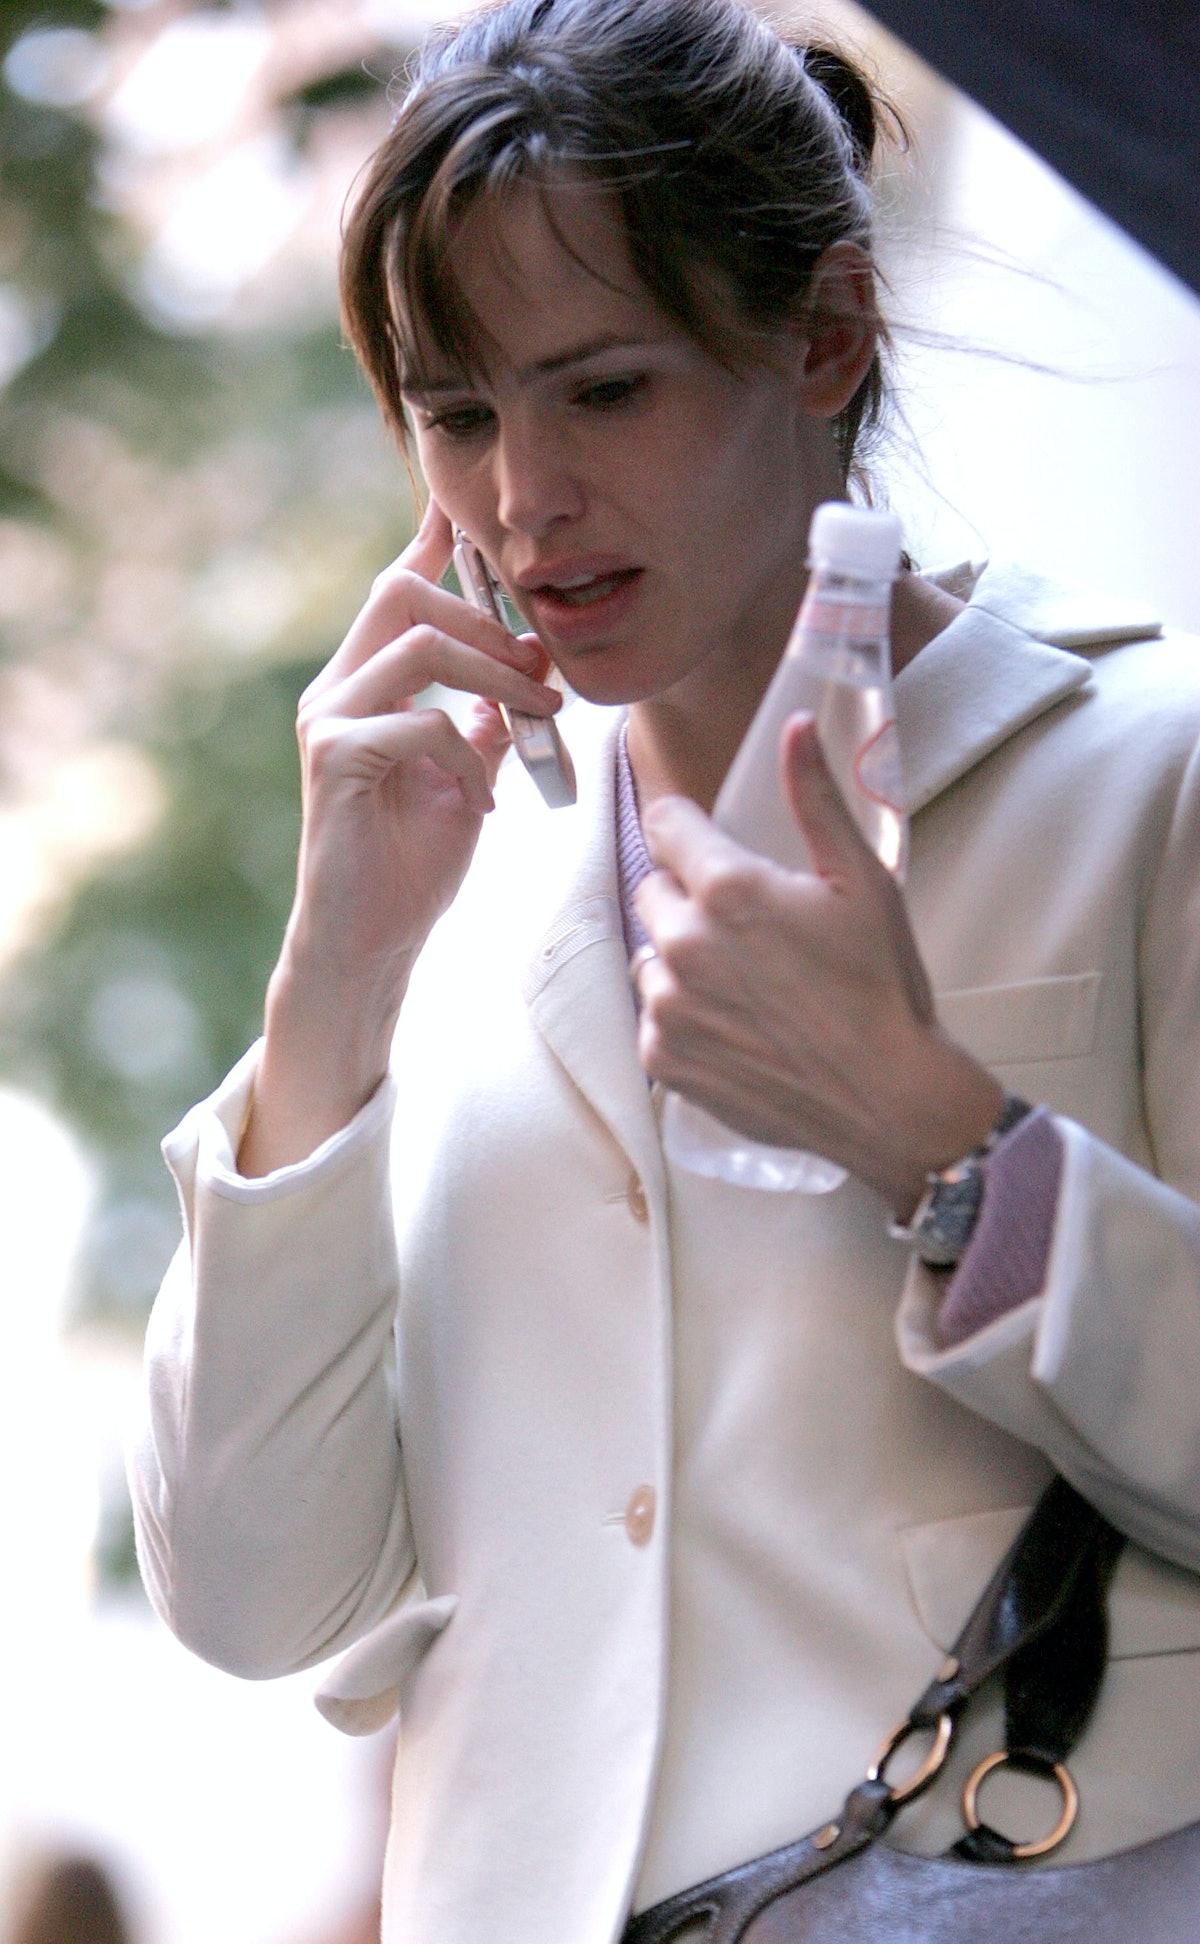 Ben Affleck, Jennifer Garner and Kelly Ripa Sightings in New York City - October 21, 2007